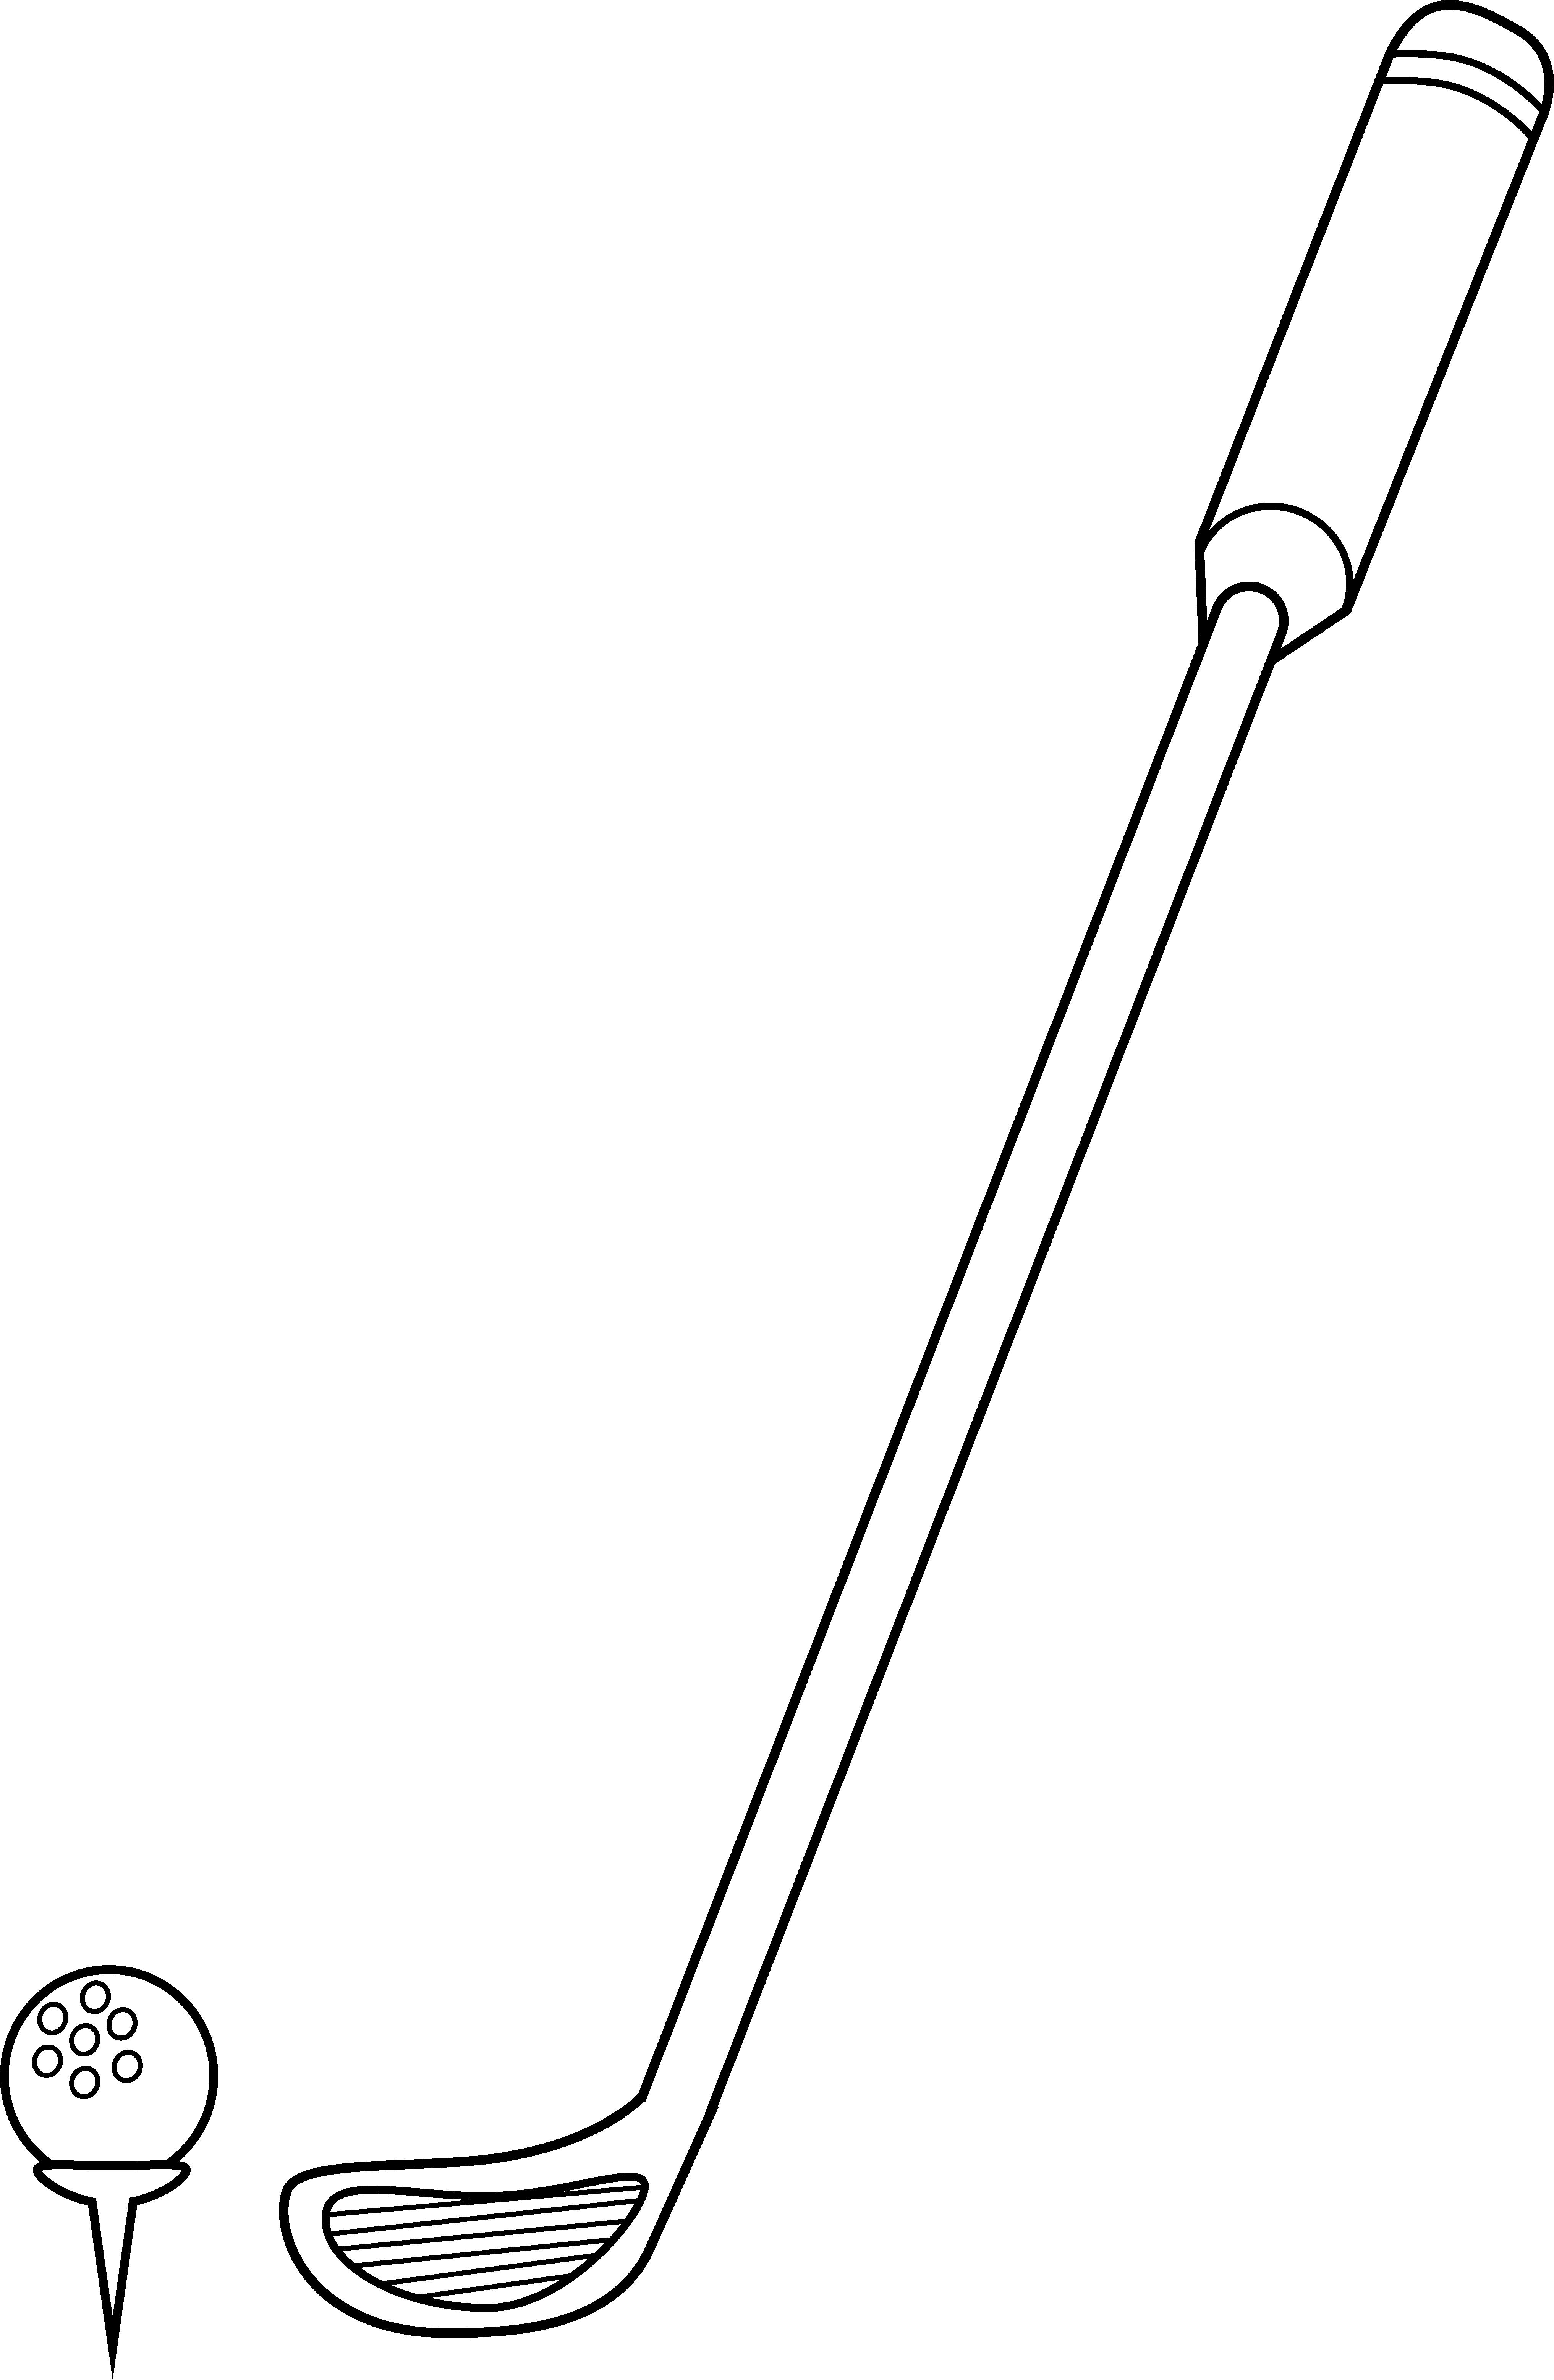 Image Result For Golf Cart Cartoon